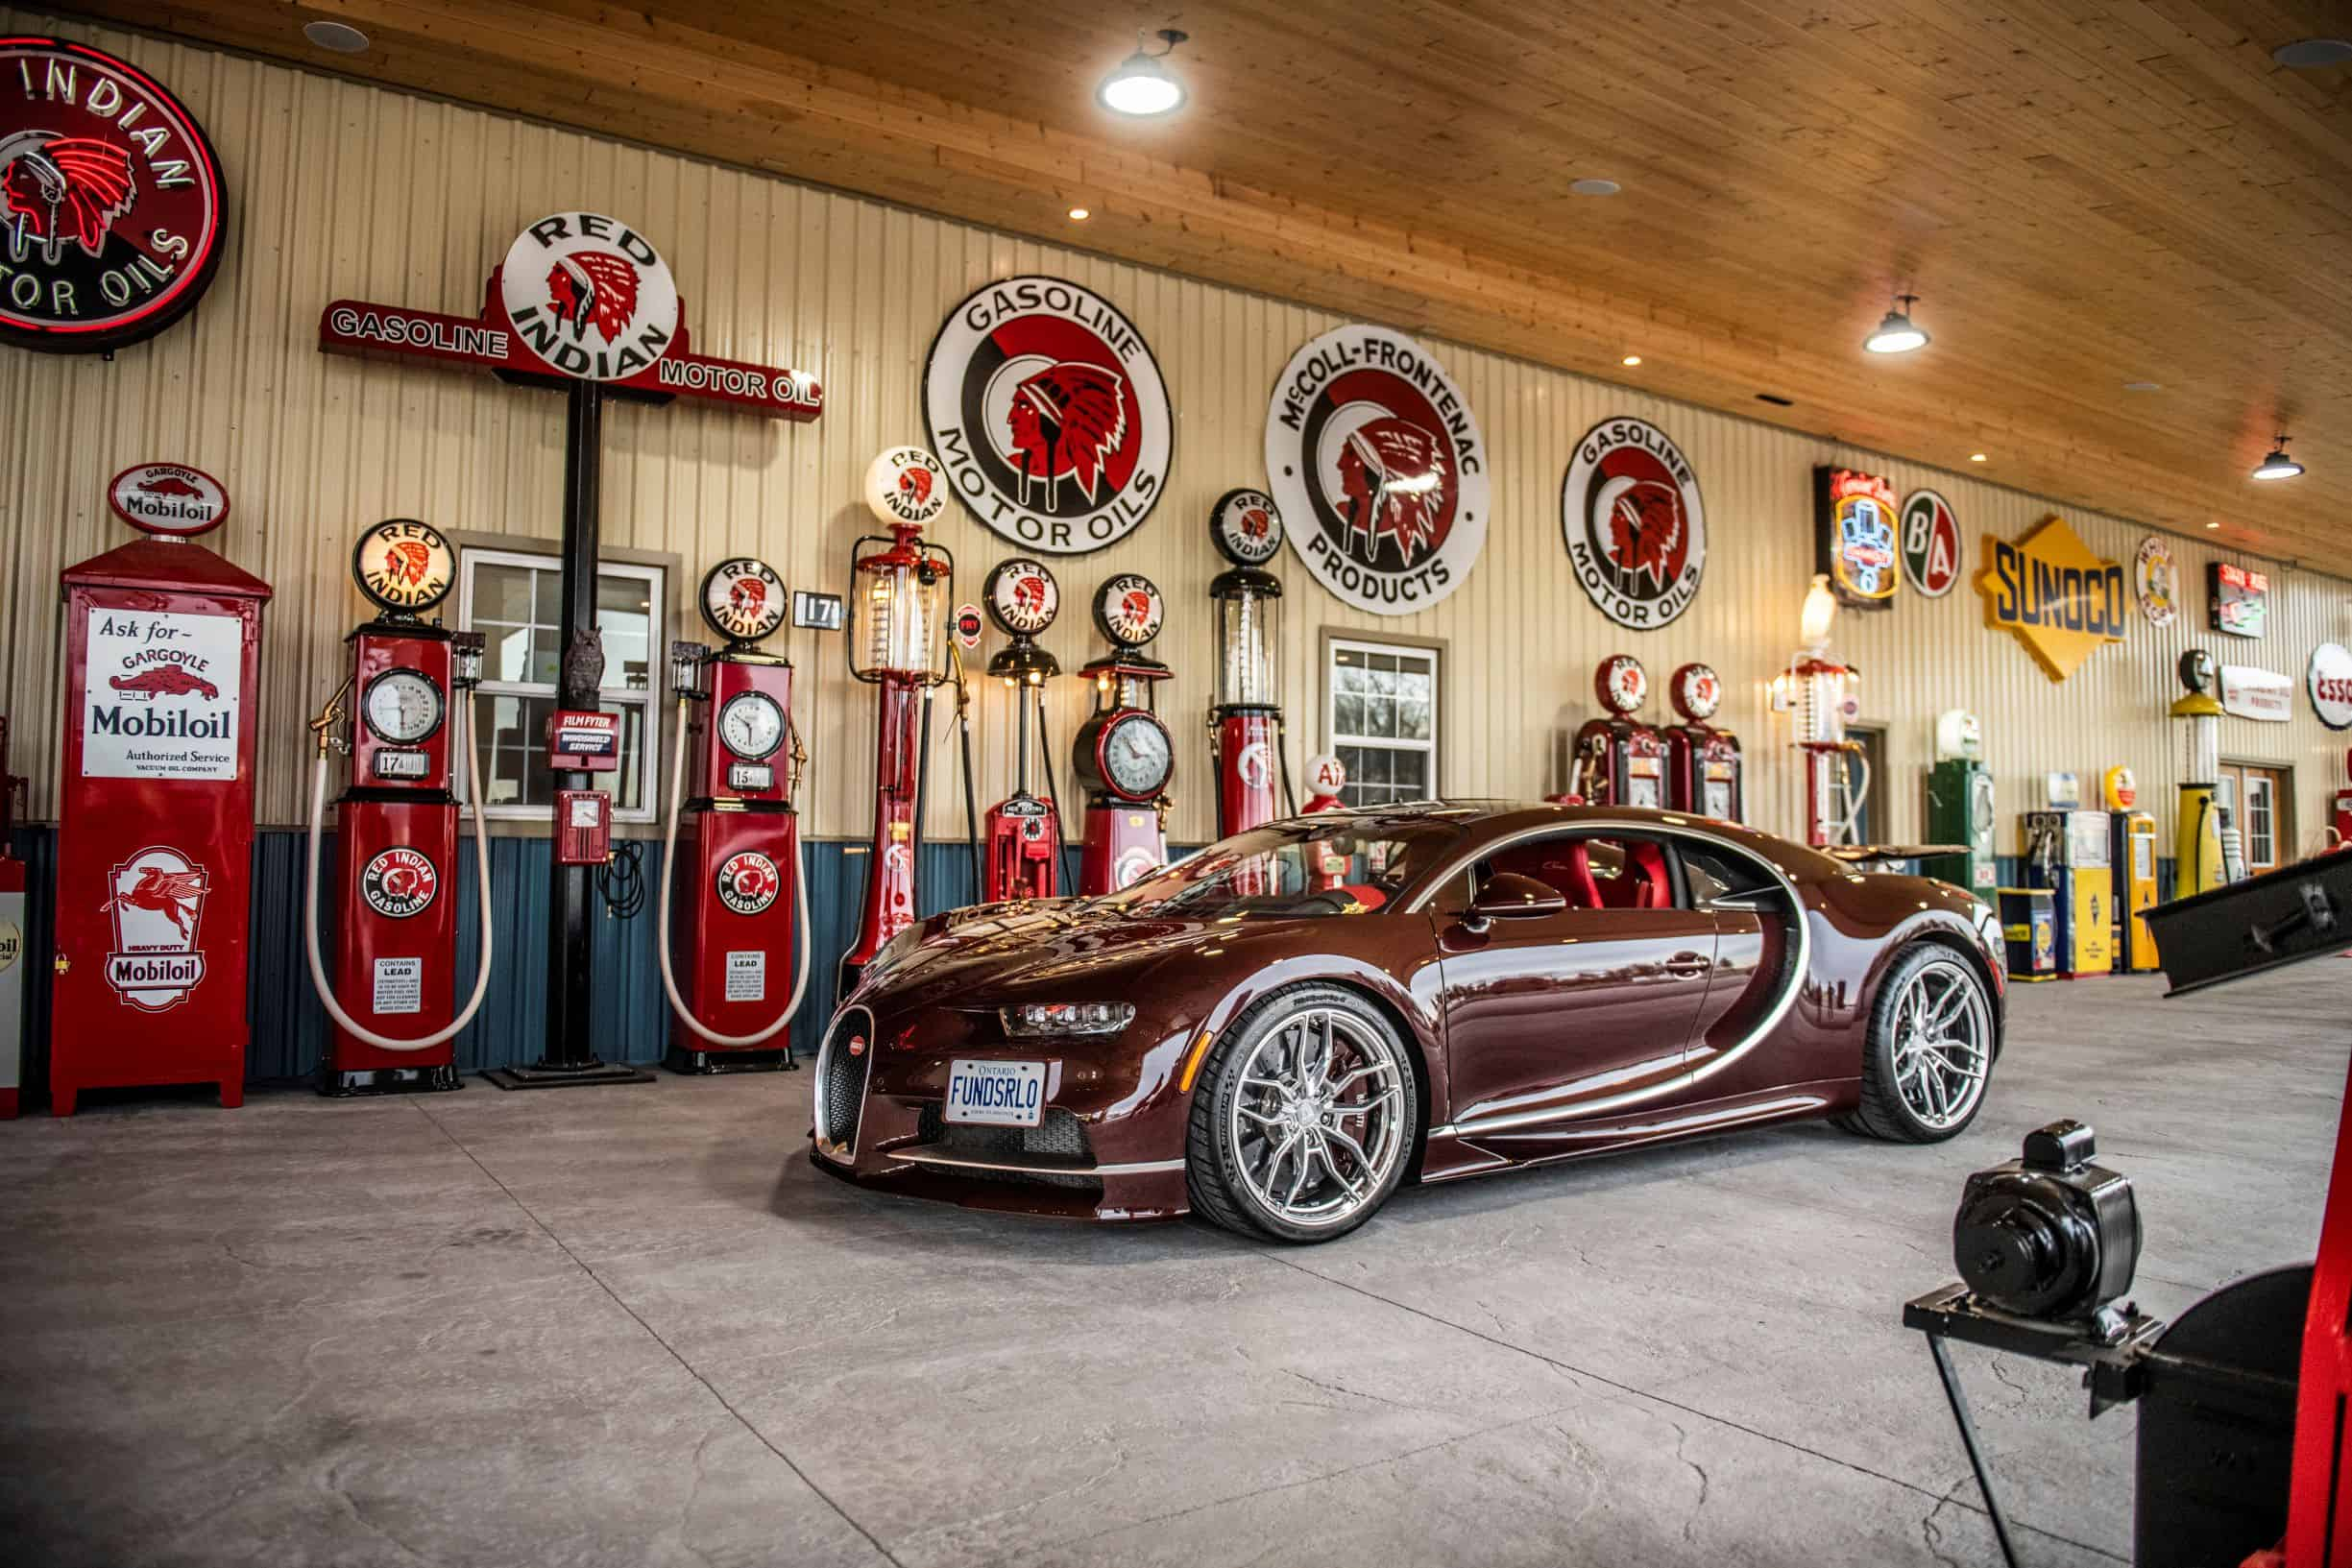 Bugatti photographed by Scarfone